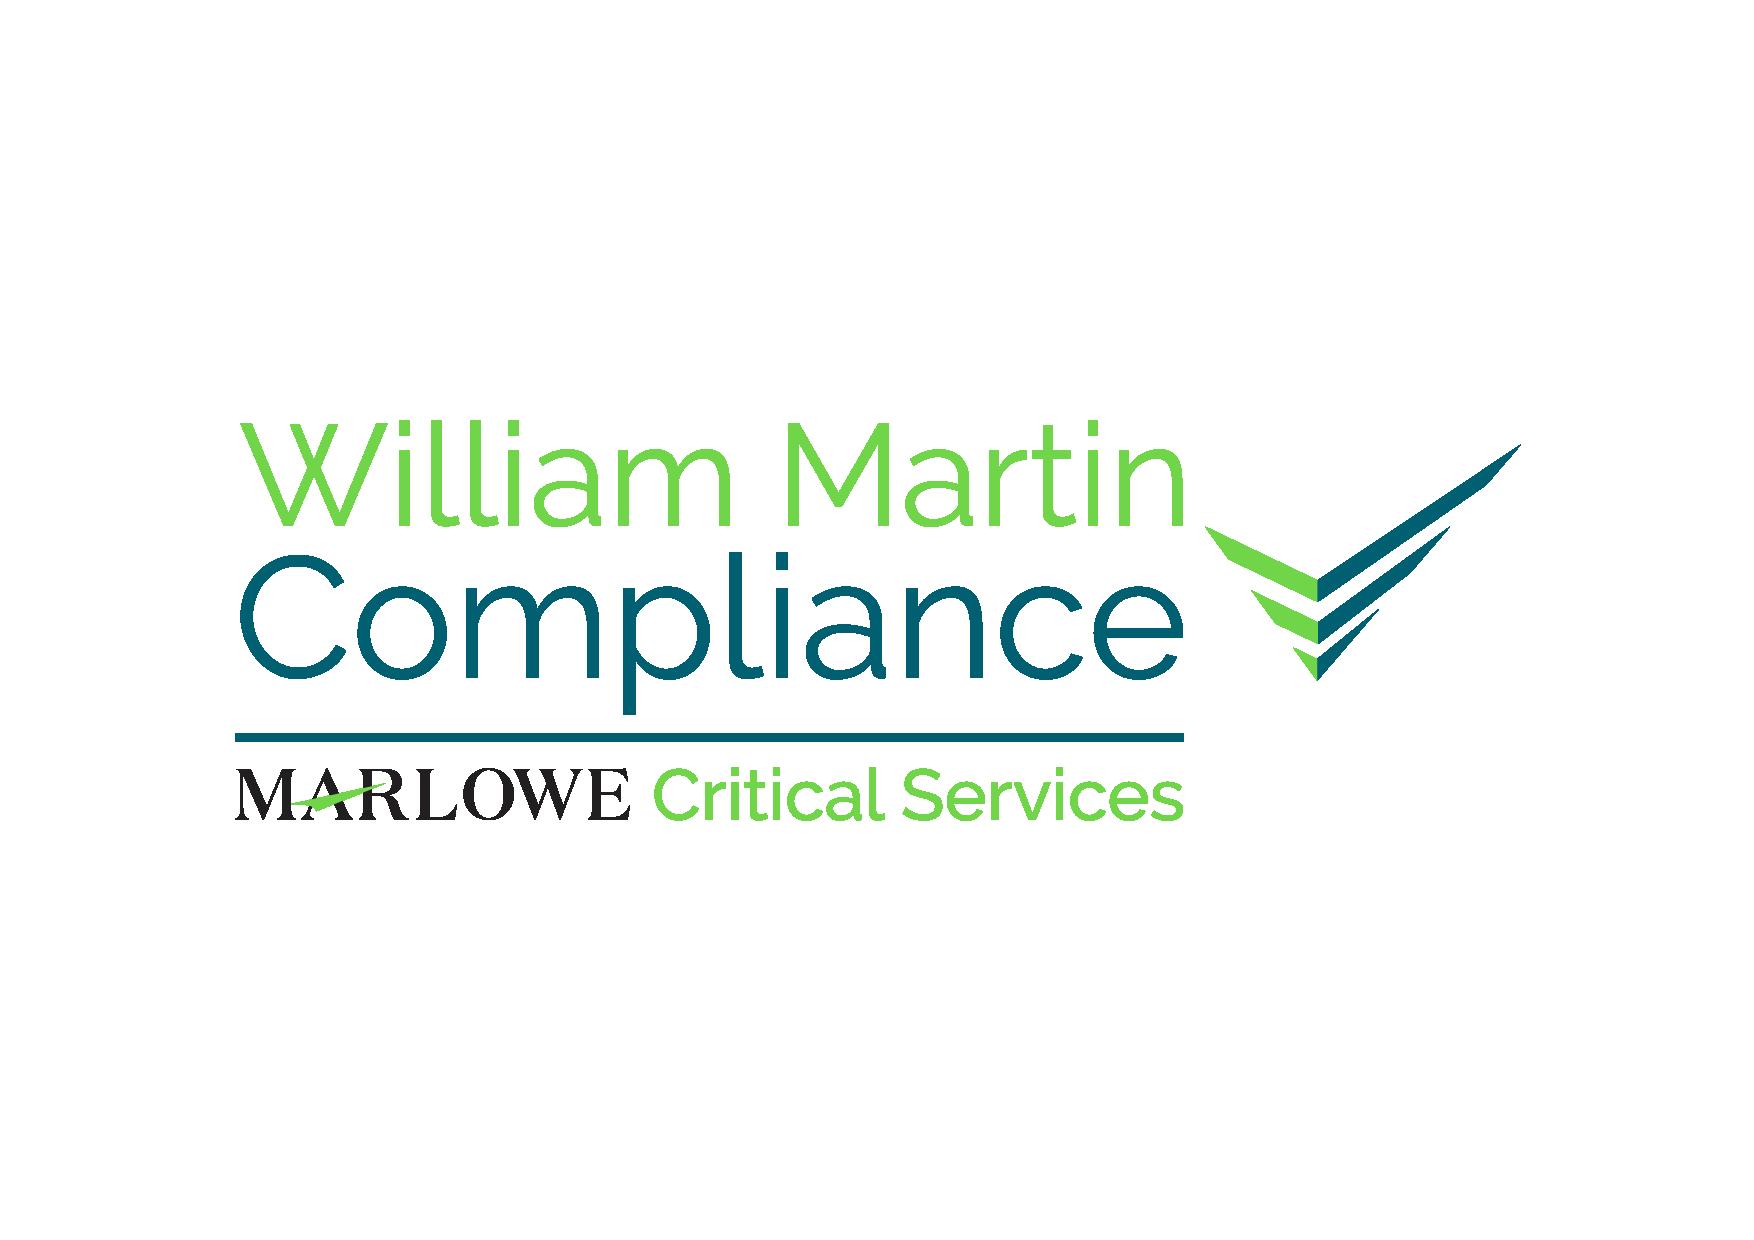 William Martin Compliance